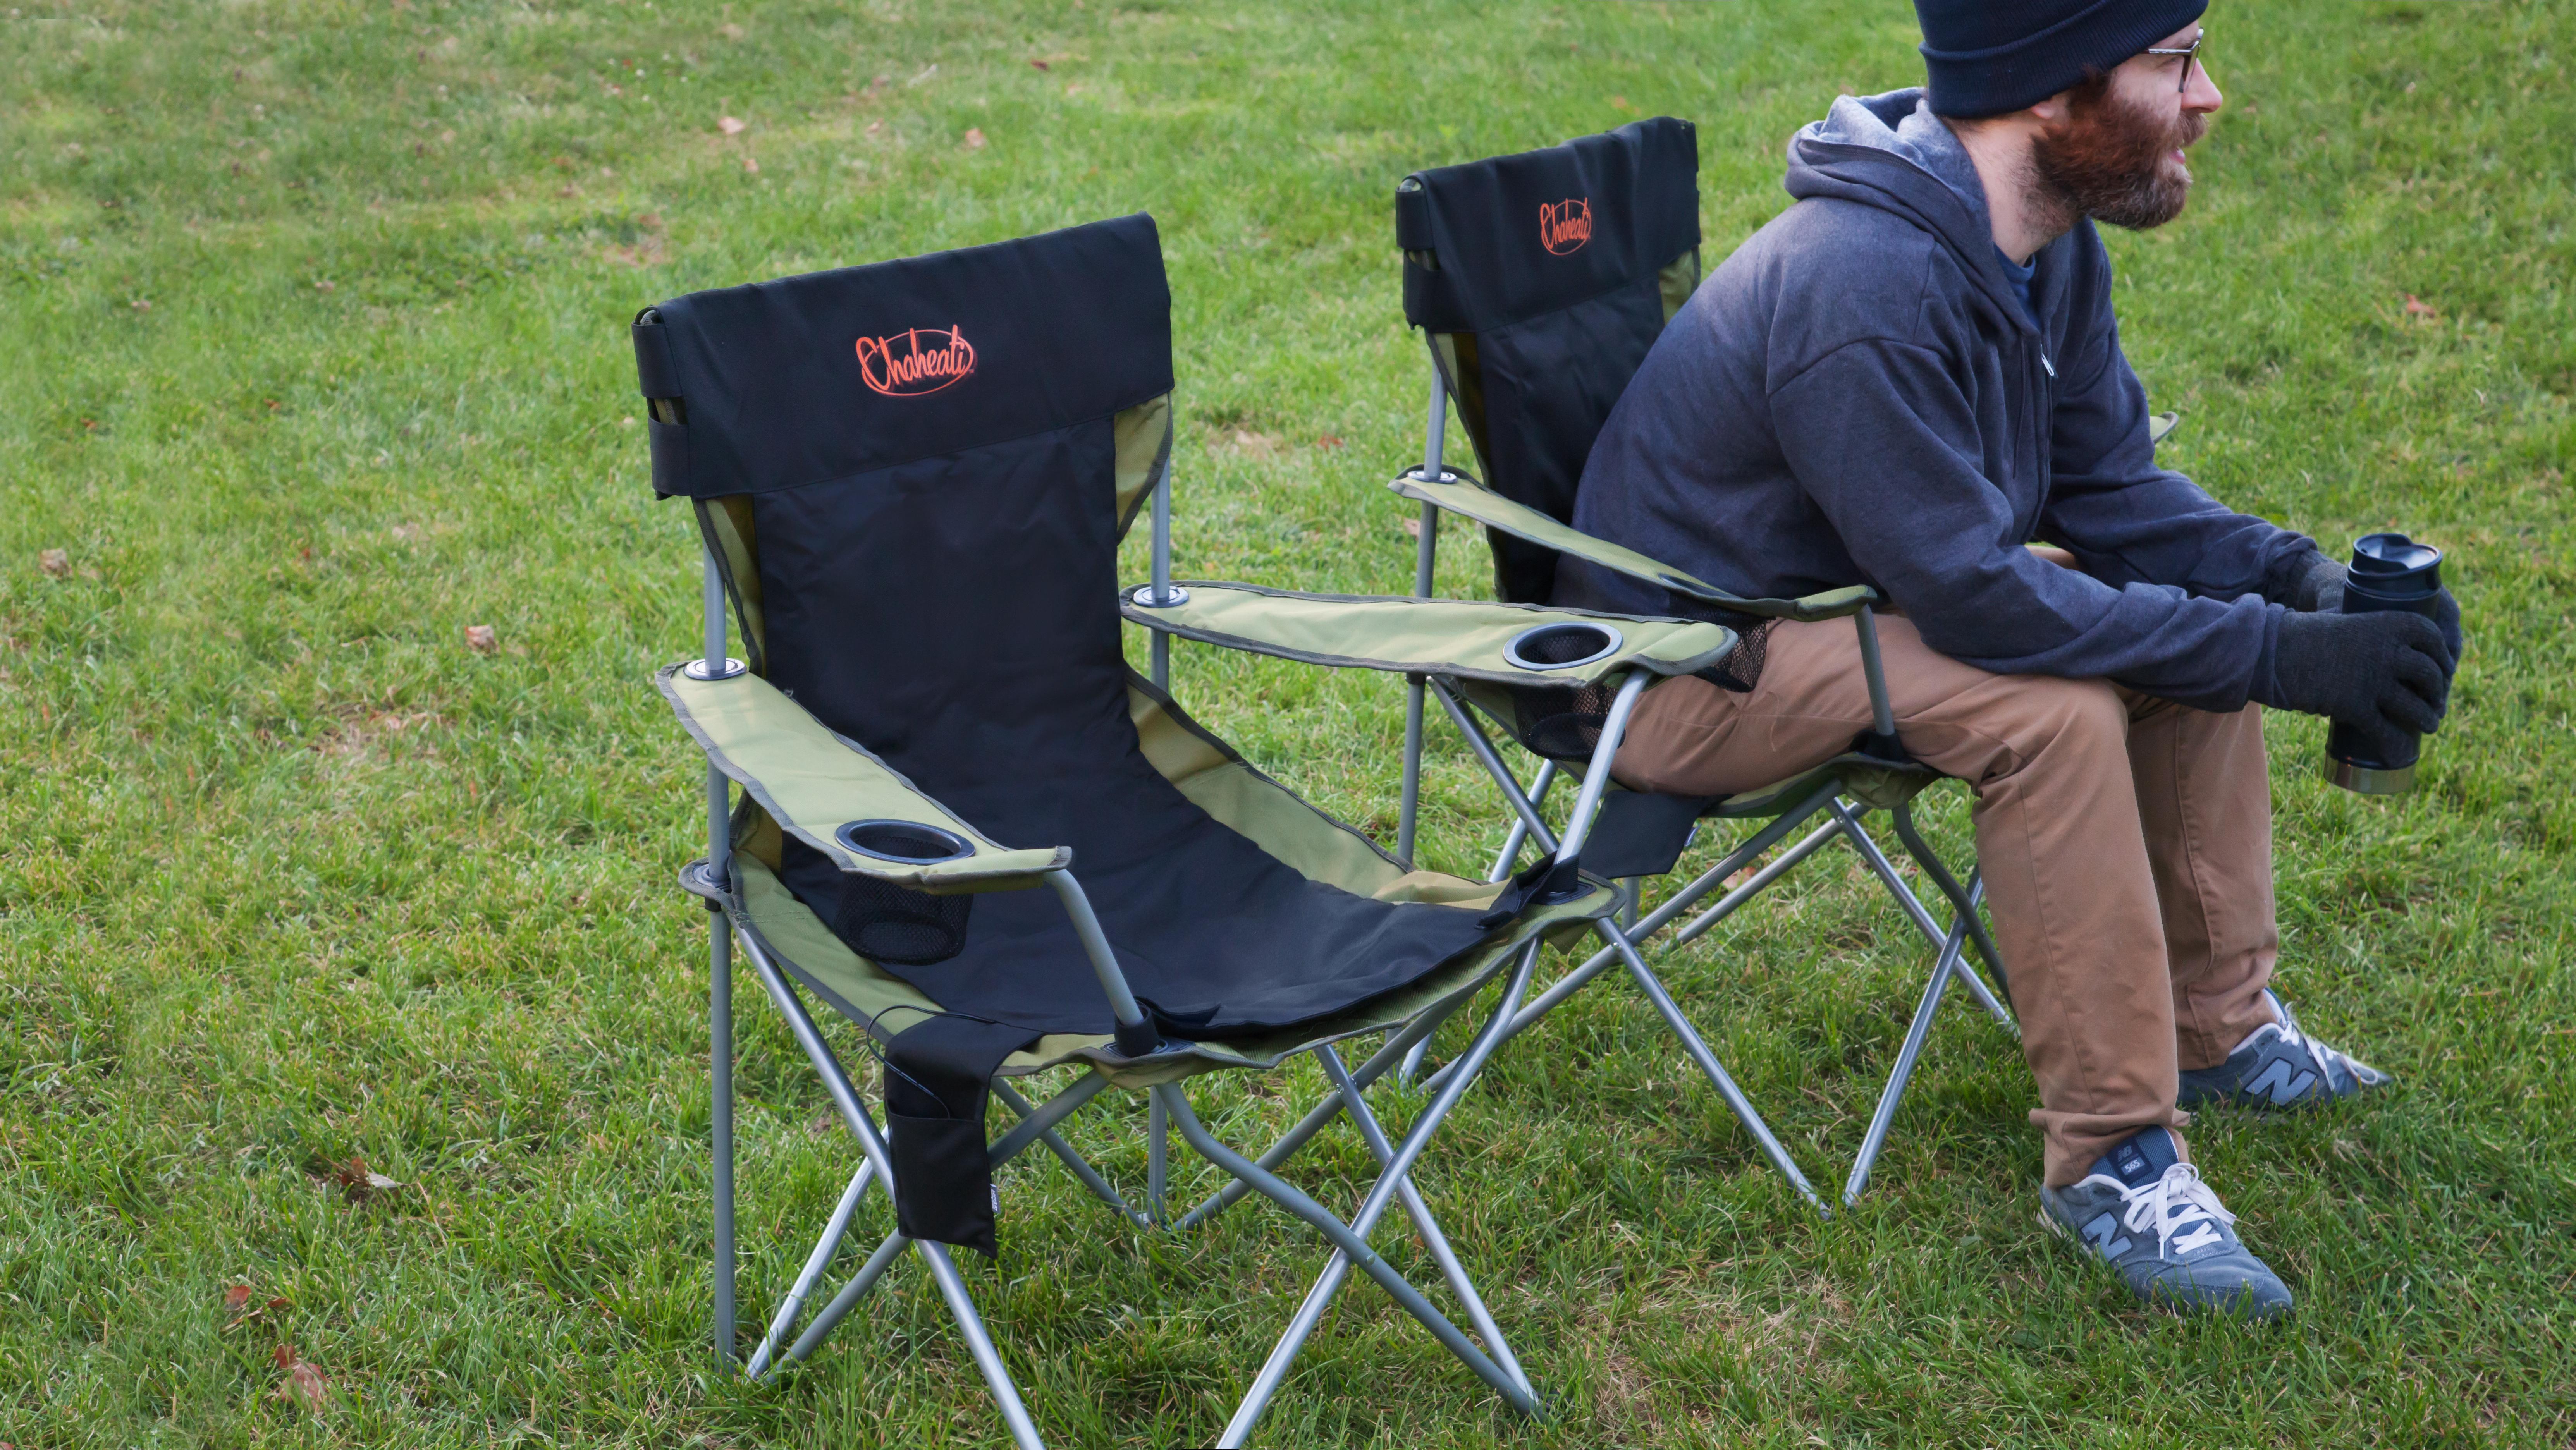 Chaheati travel heated seat cover